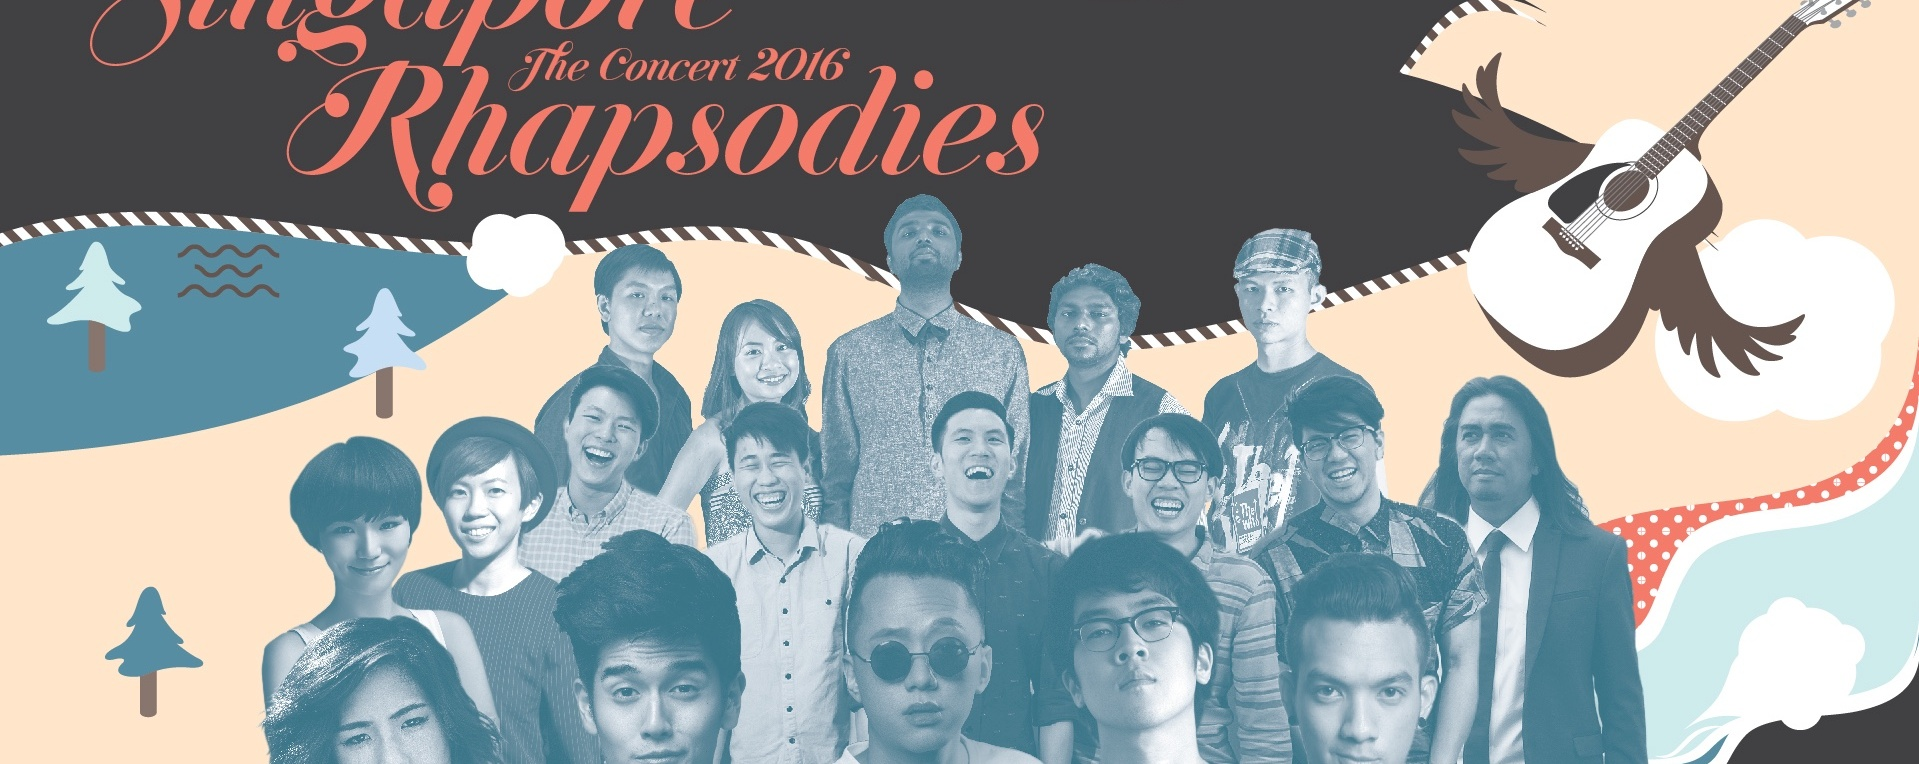 Singapore Rhapsodies - The Concert 2016